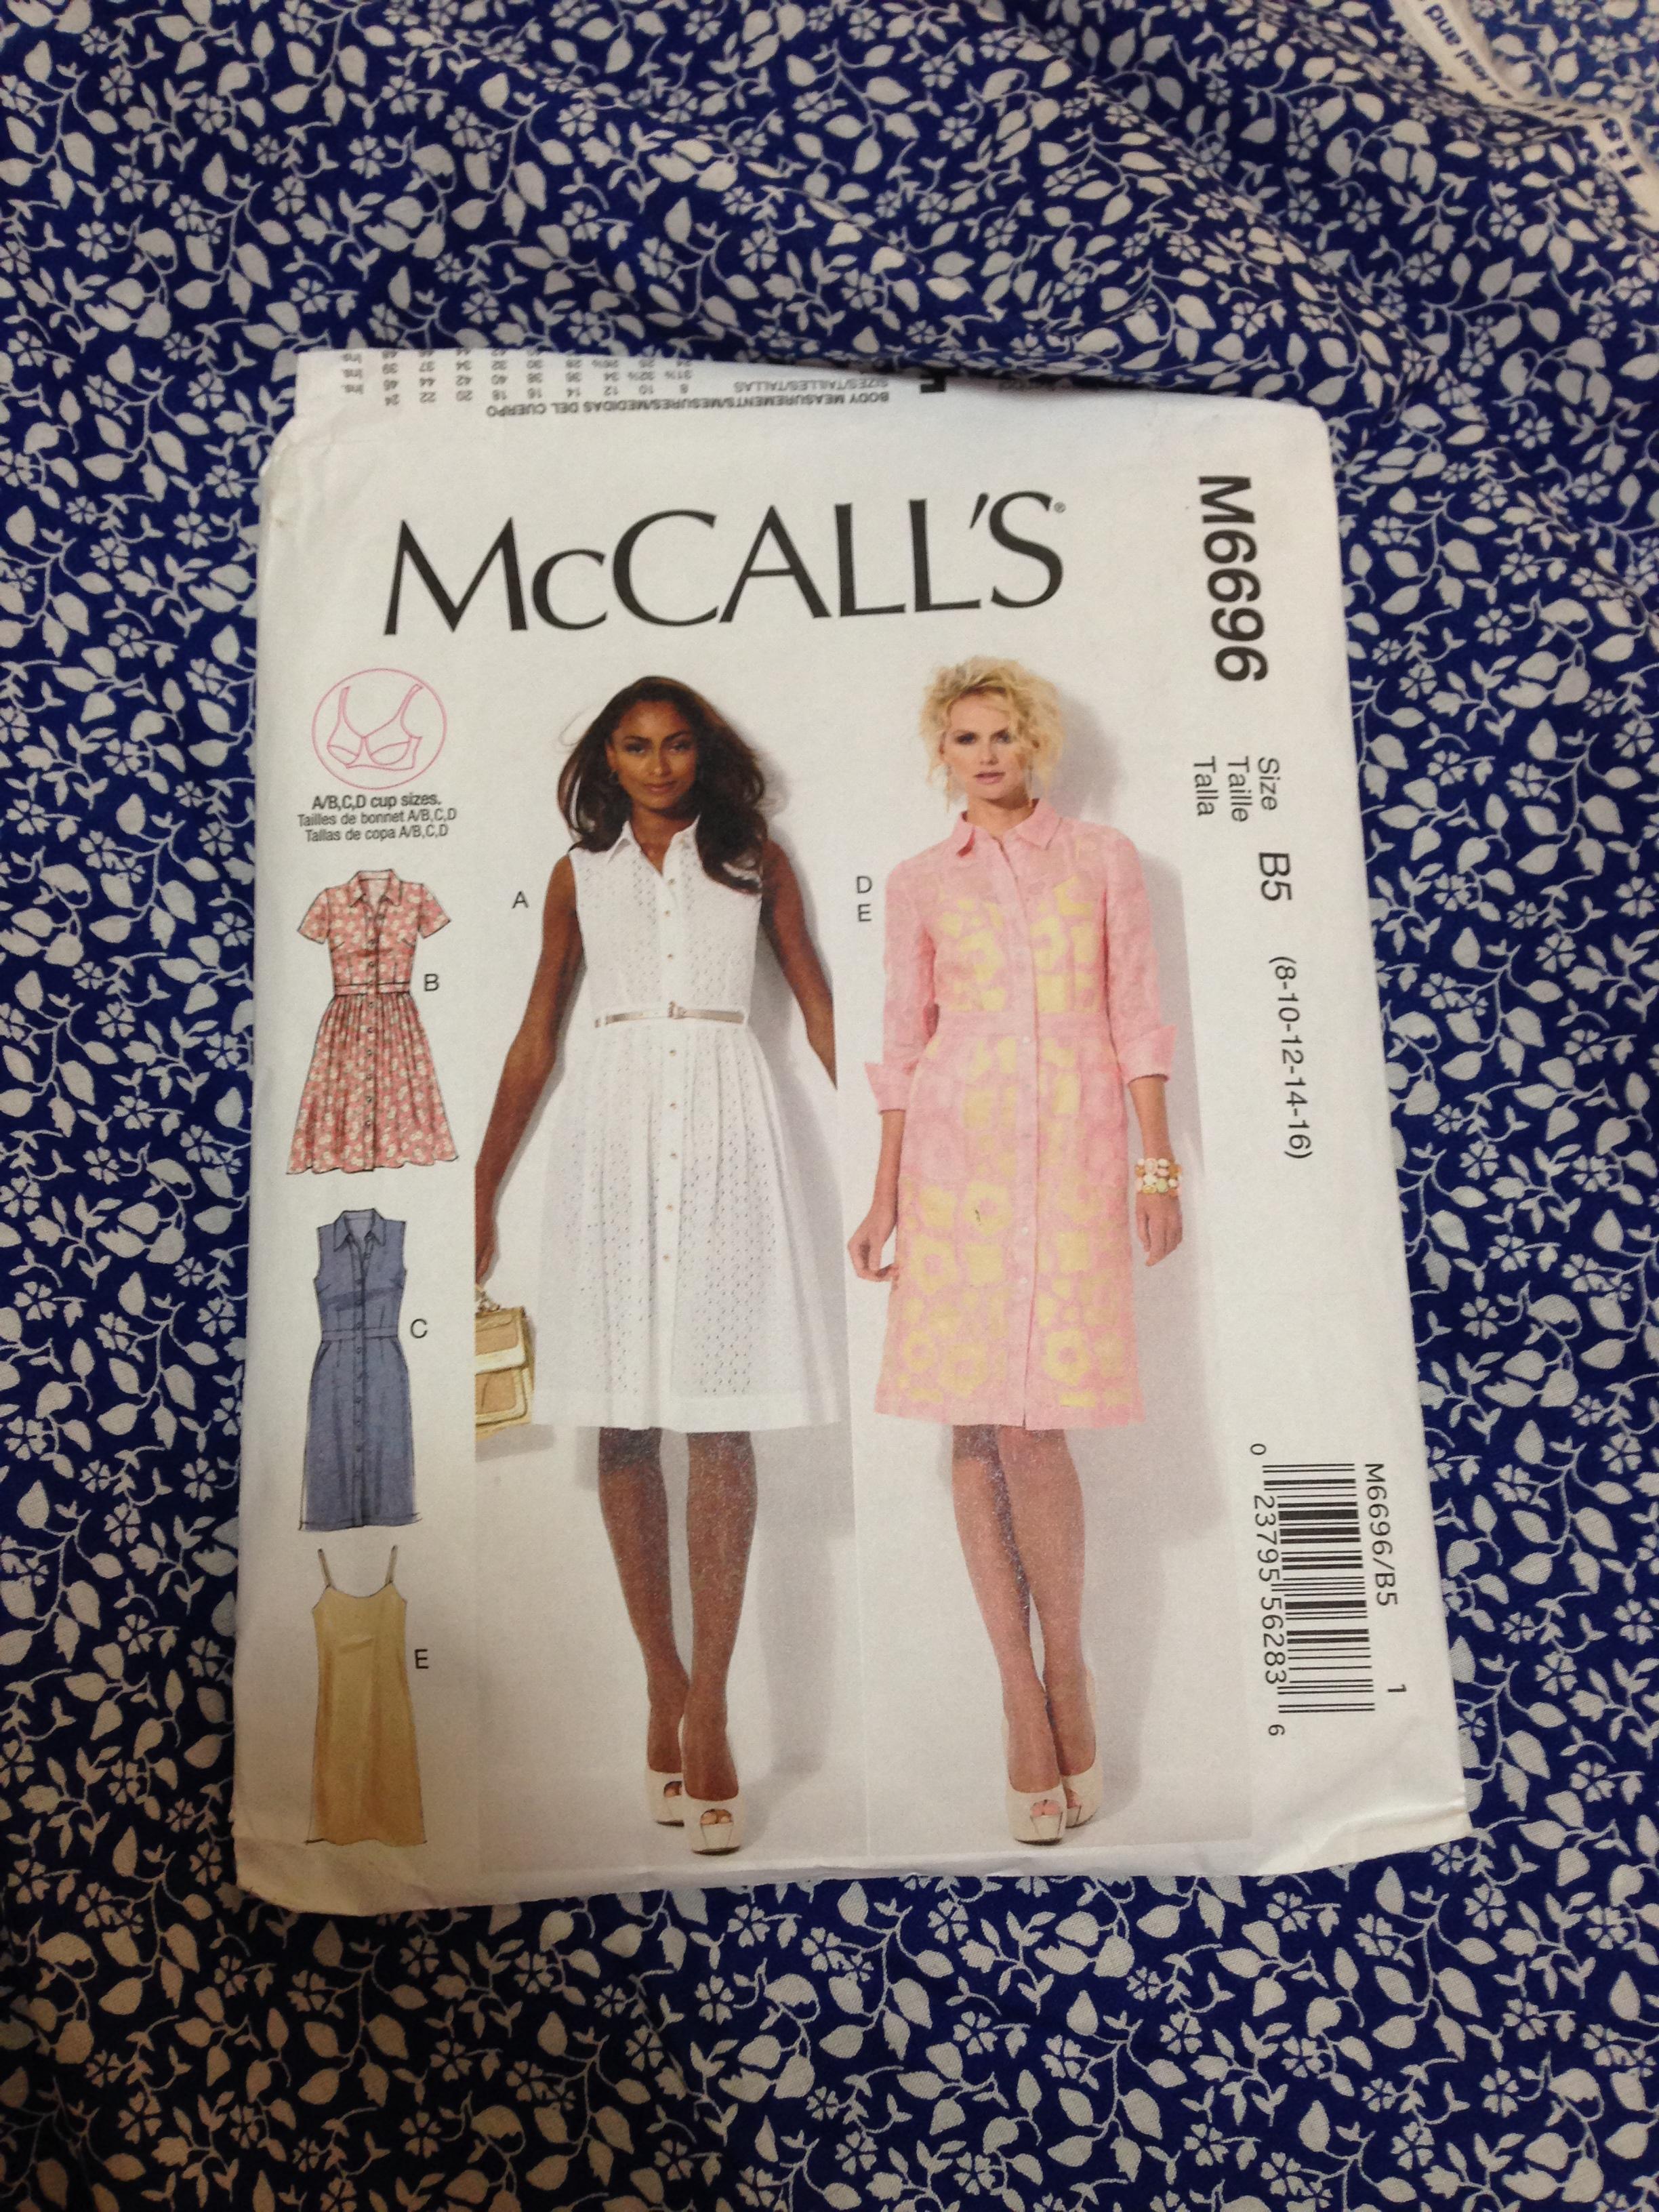 Mccalls sew busy lizzy mccalls 6696 the pattern jeuxipadfo Gallery